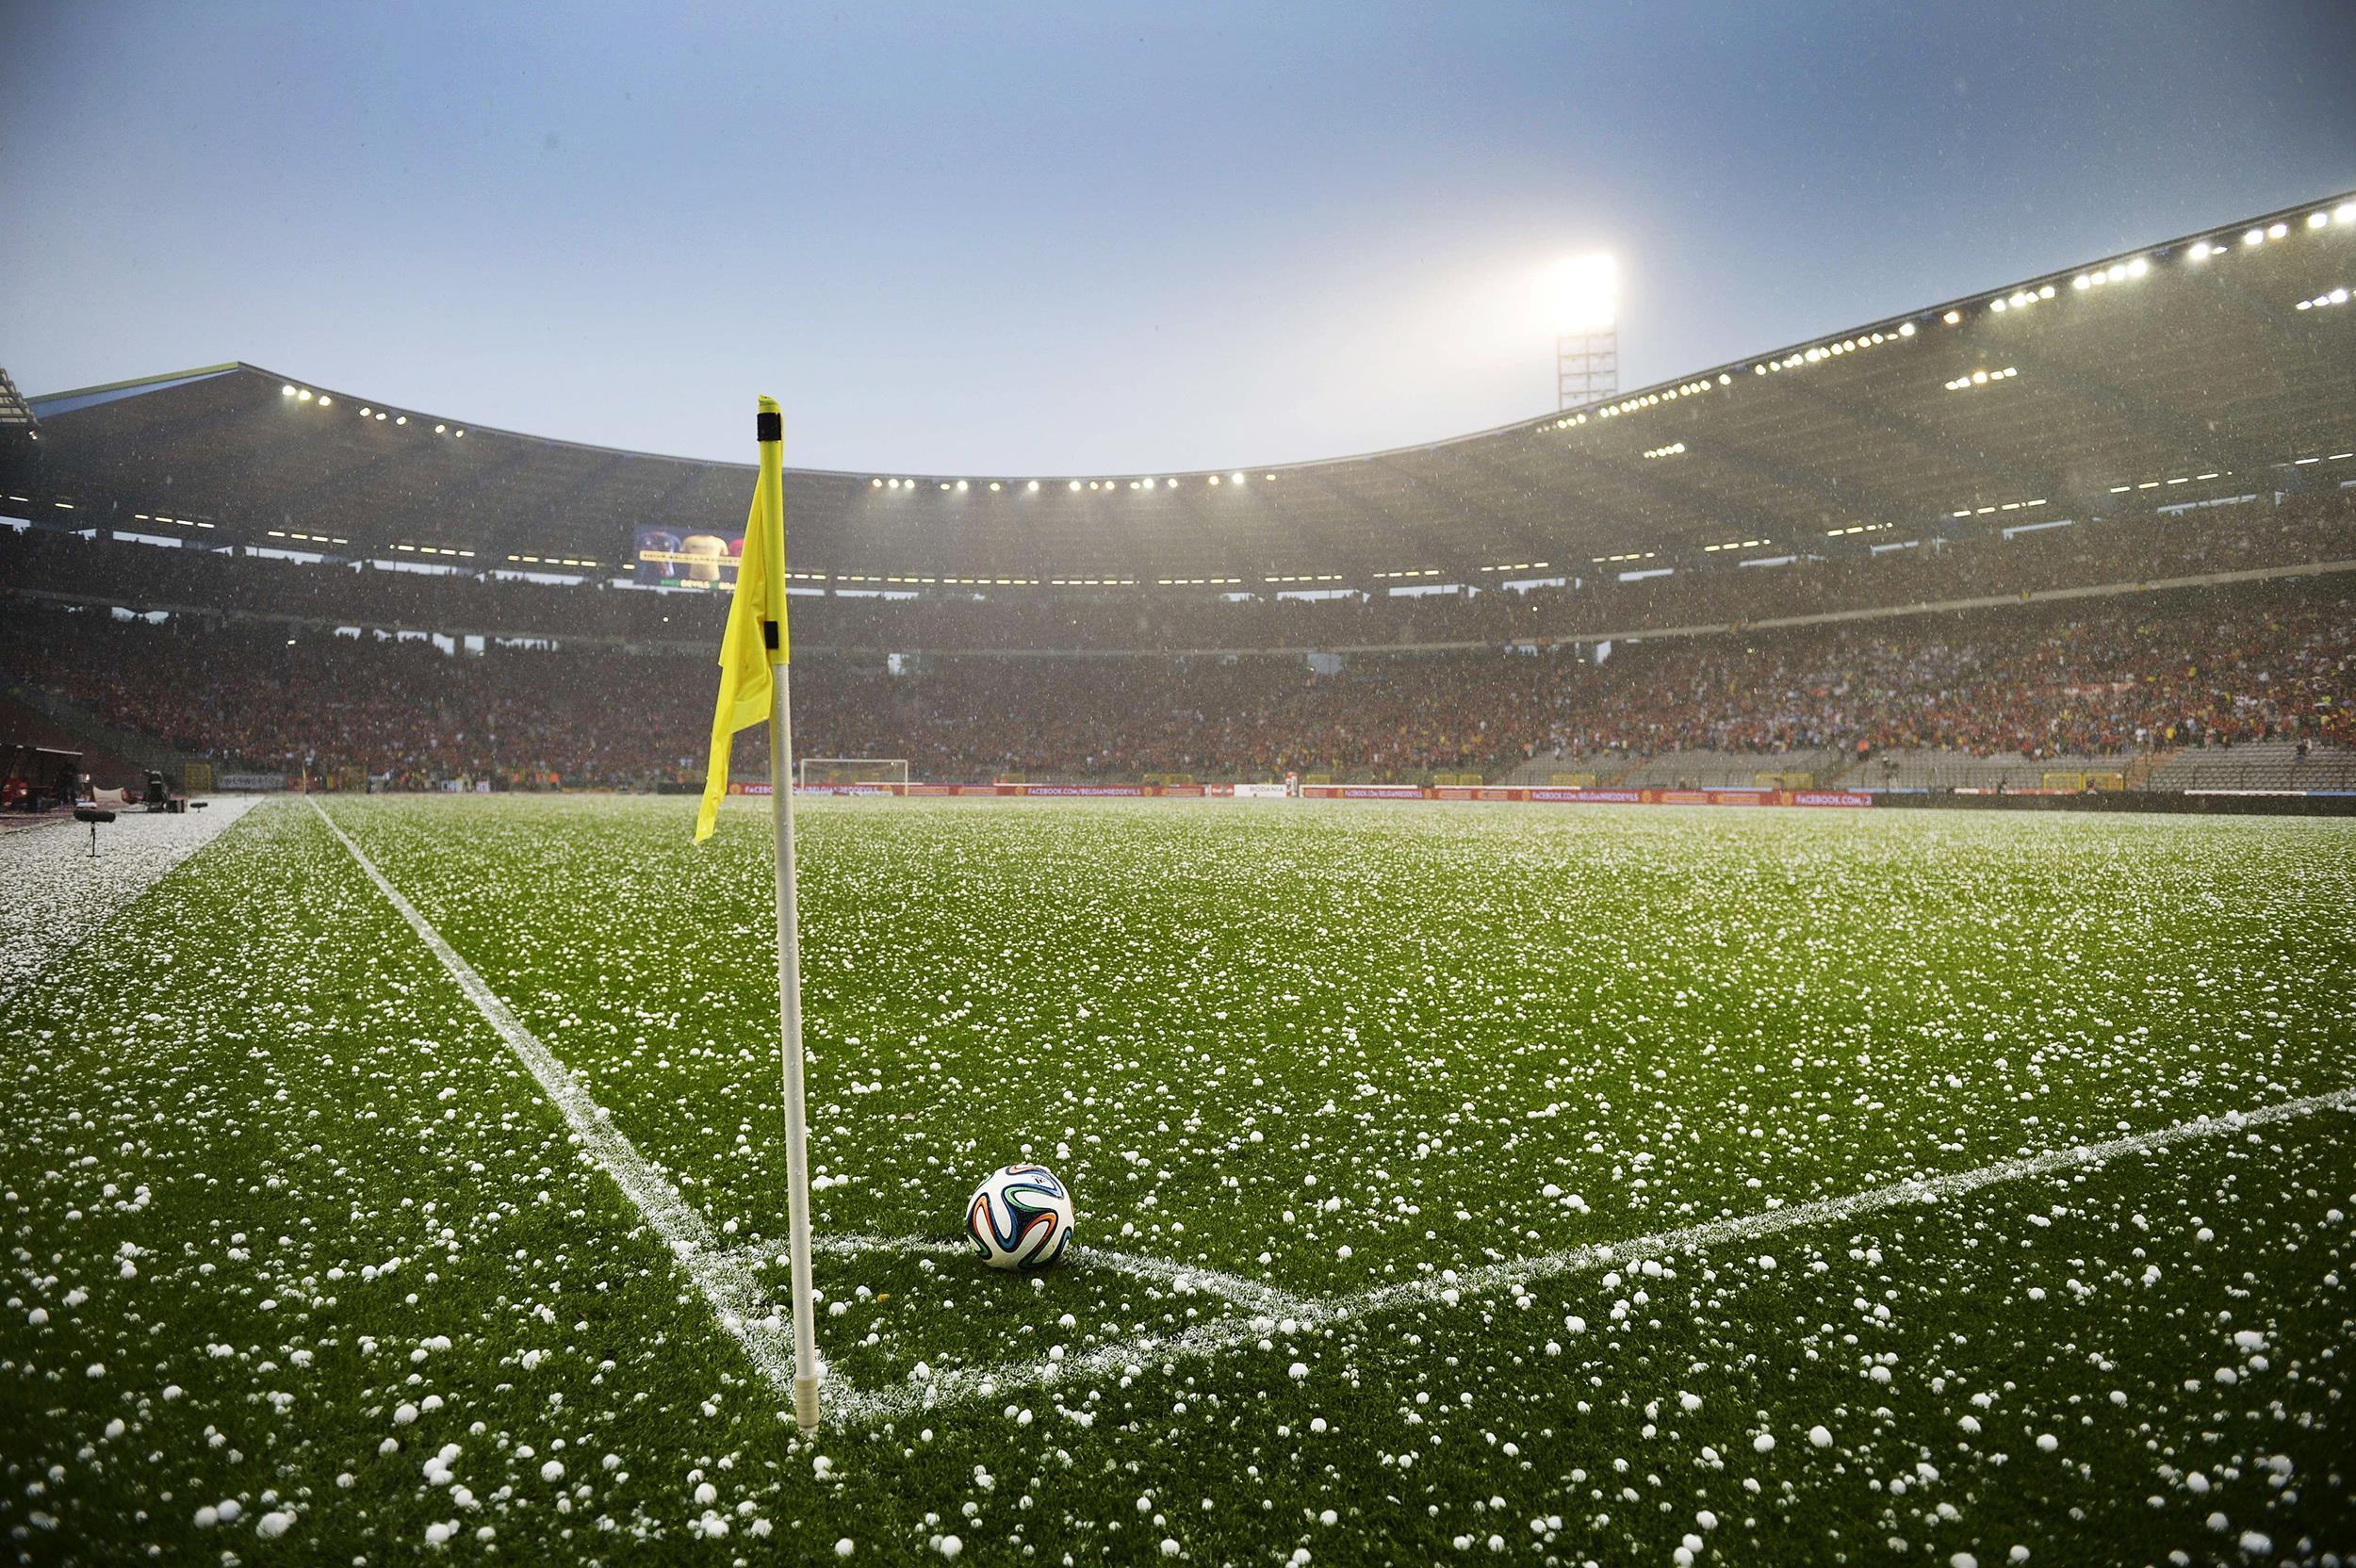 hailstorm halts friendly soccer match in belgium nbc news